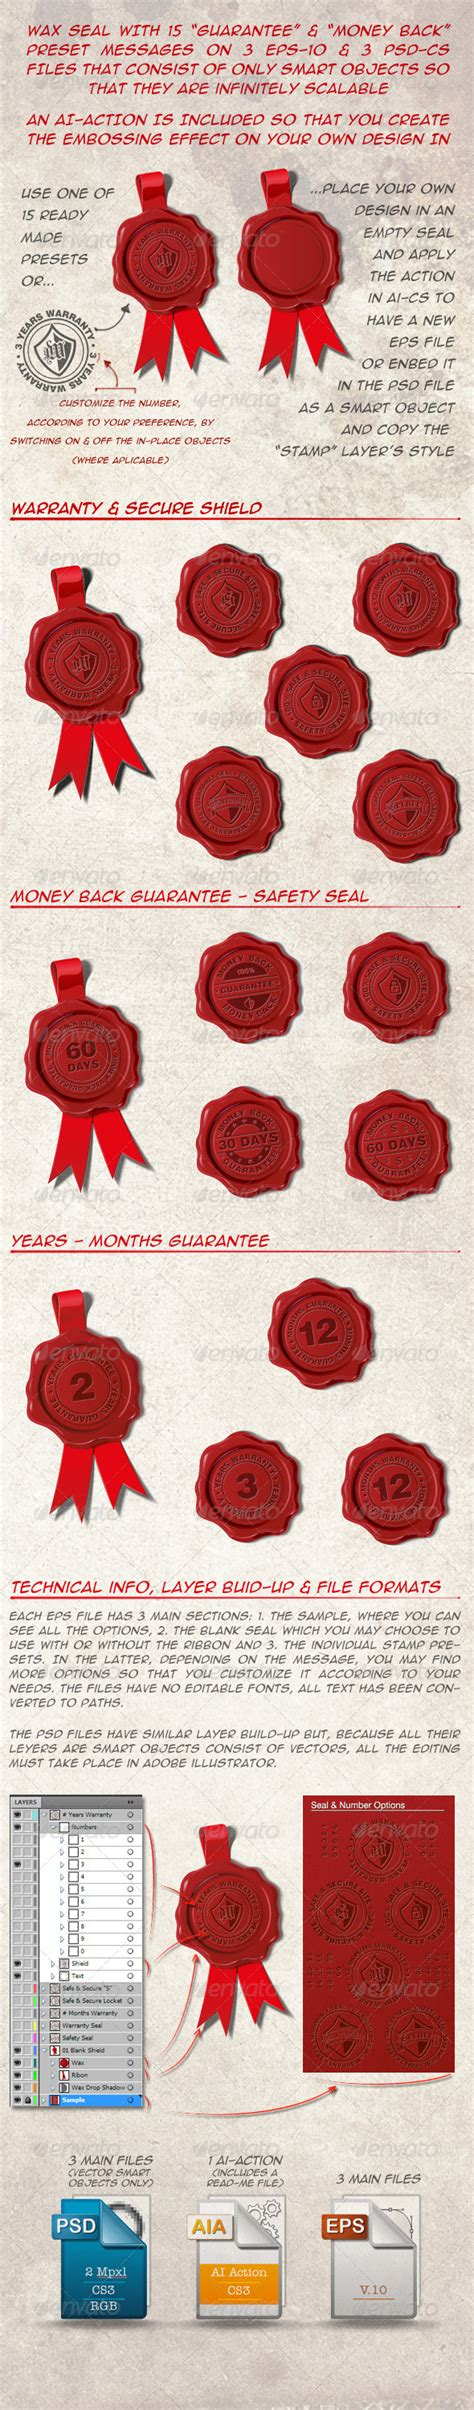 back to back warranty stock vector graphicriver 15 wax seal warranty guaranty